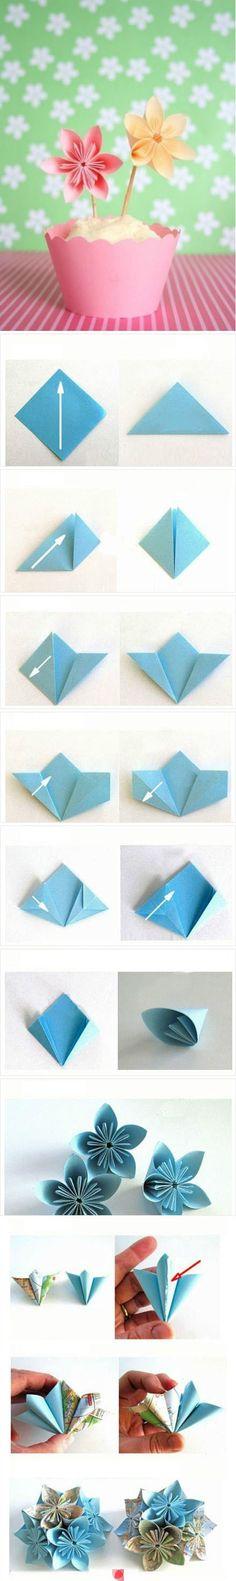 DIY Origami Paper Flower #diy #craft #origami